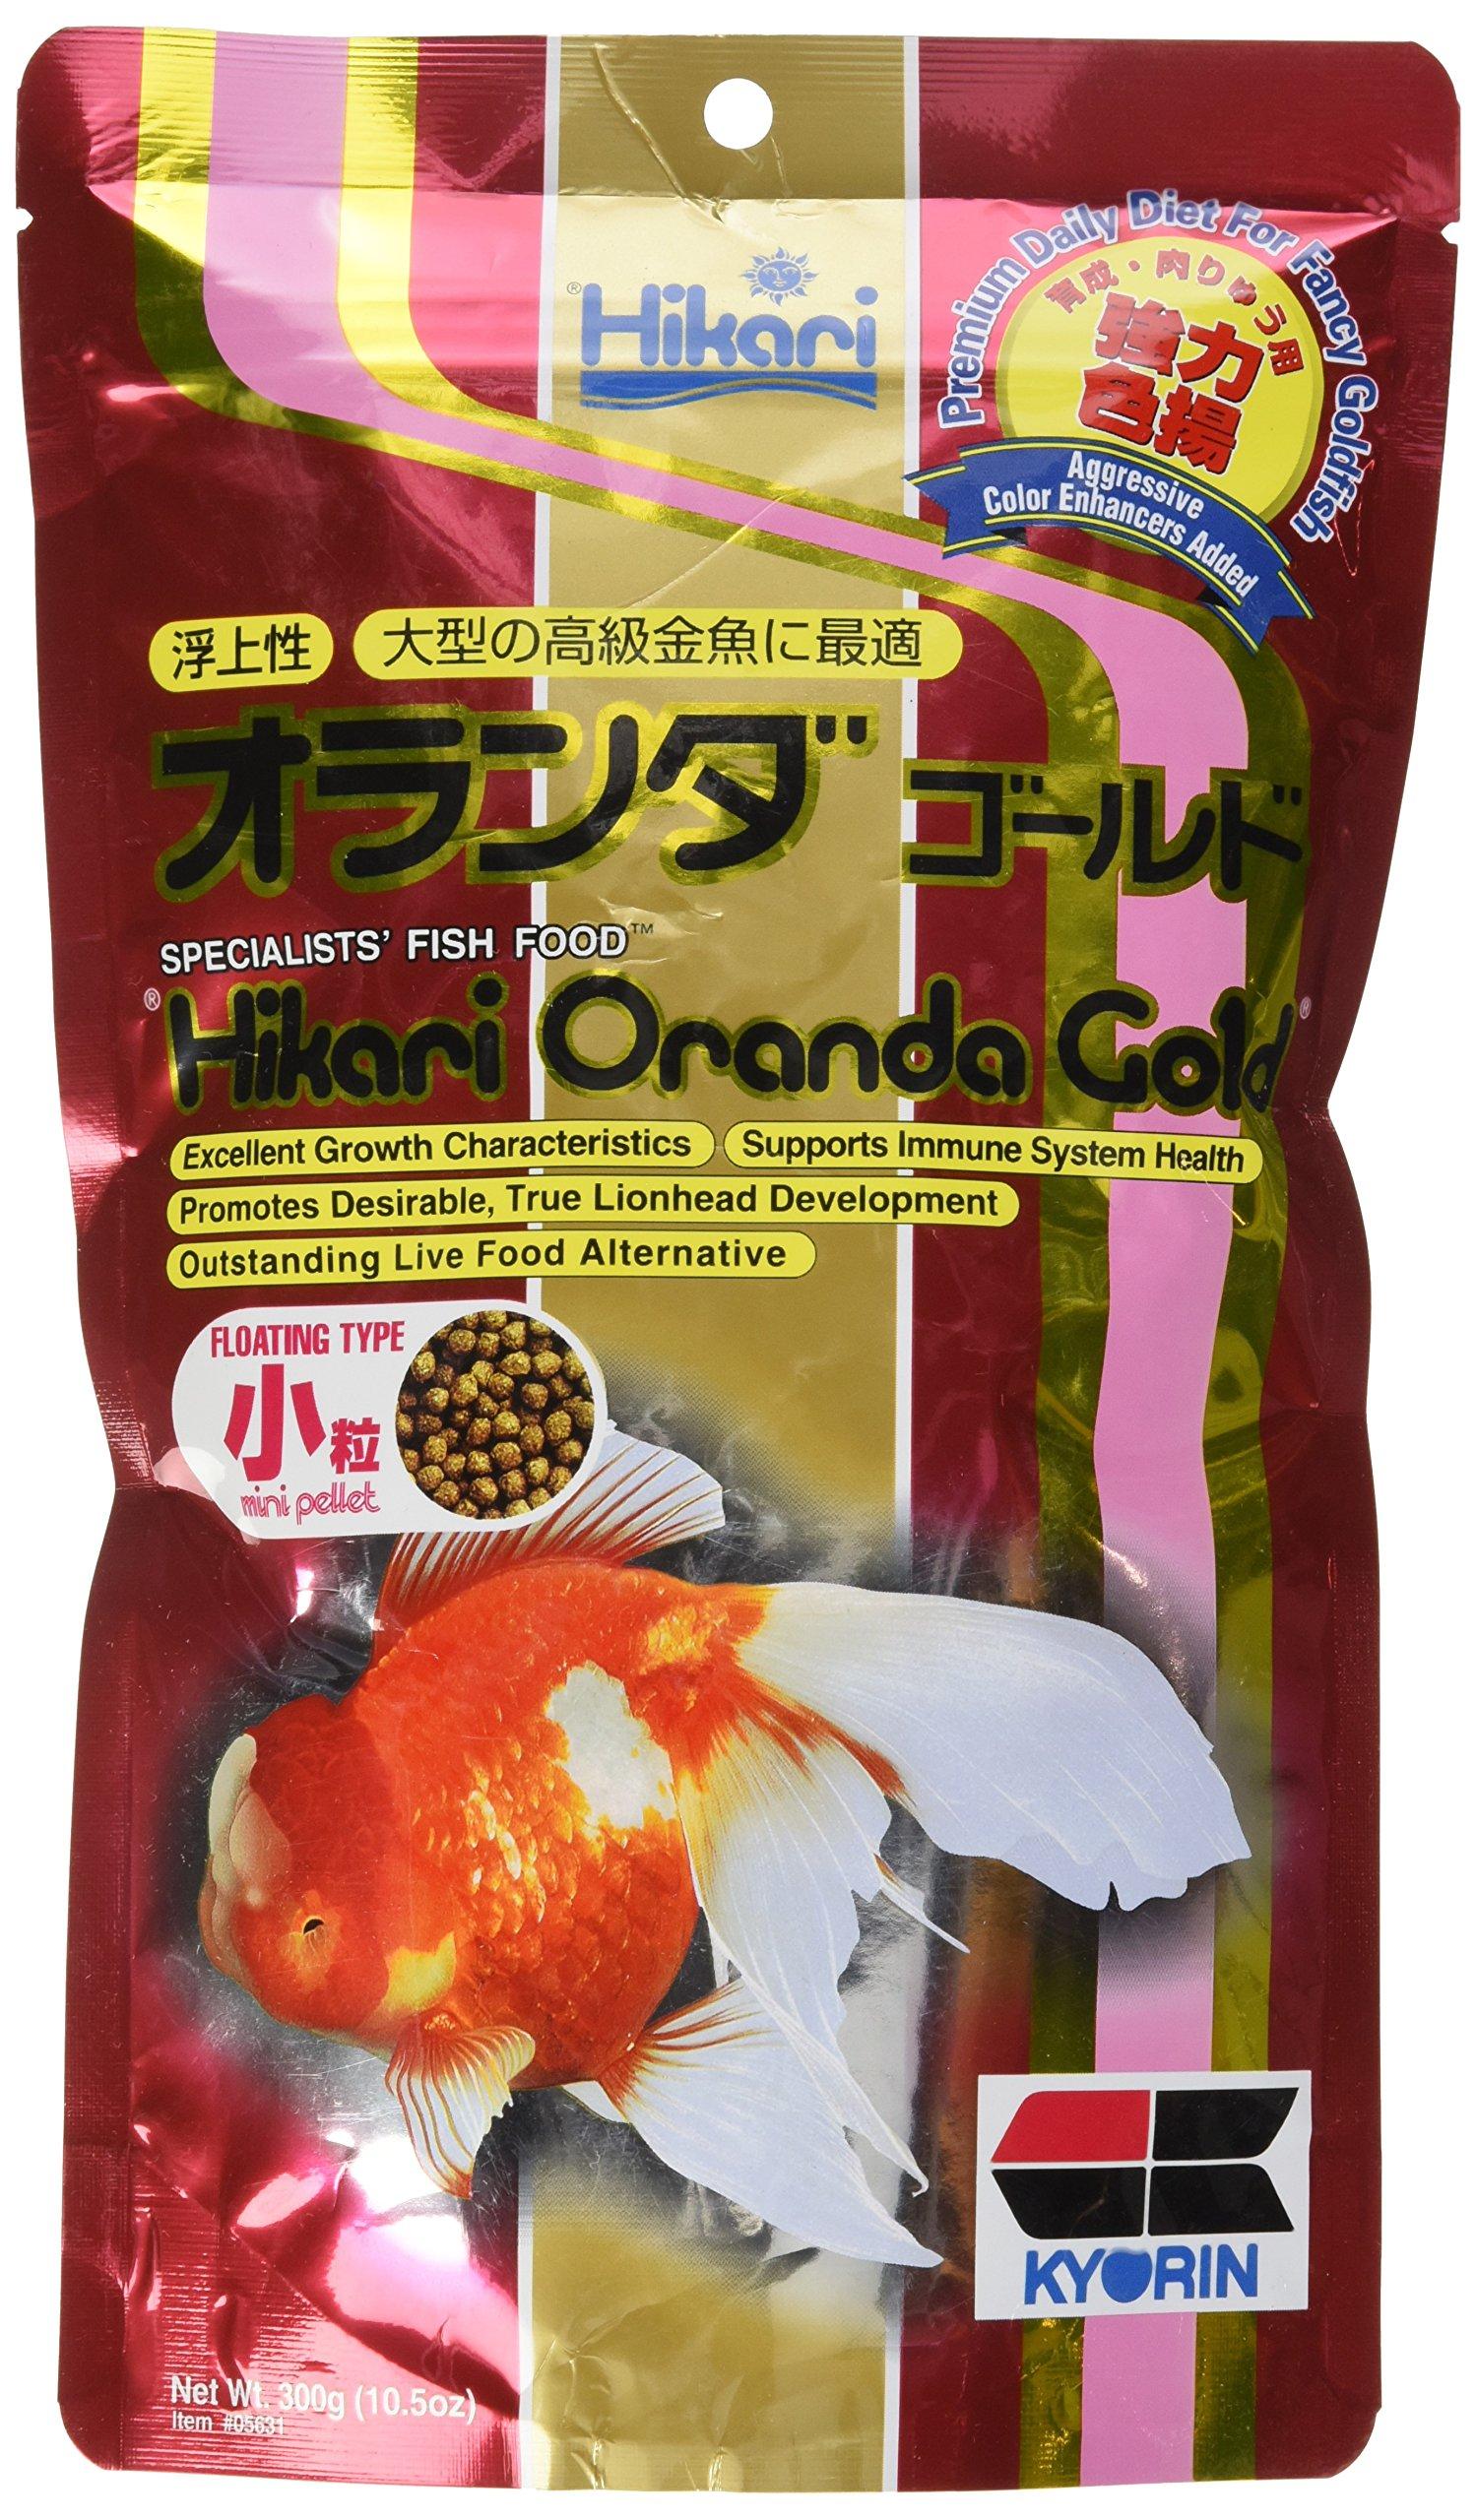 Hikari 10.5-Ounce Oranda Gold Floating Pellets for Pets, Mini